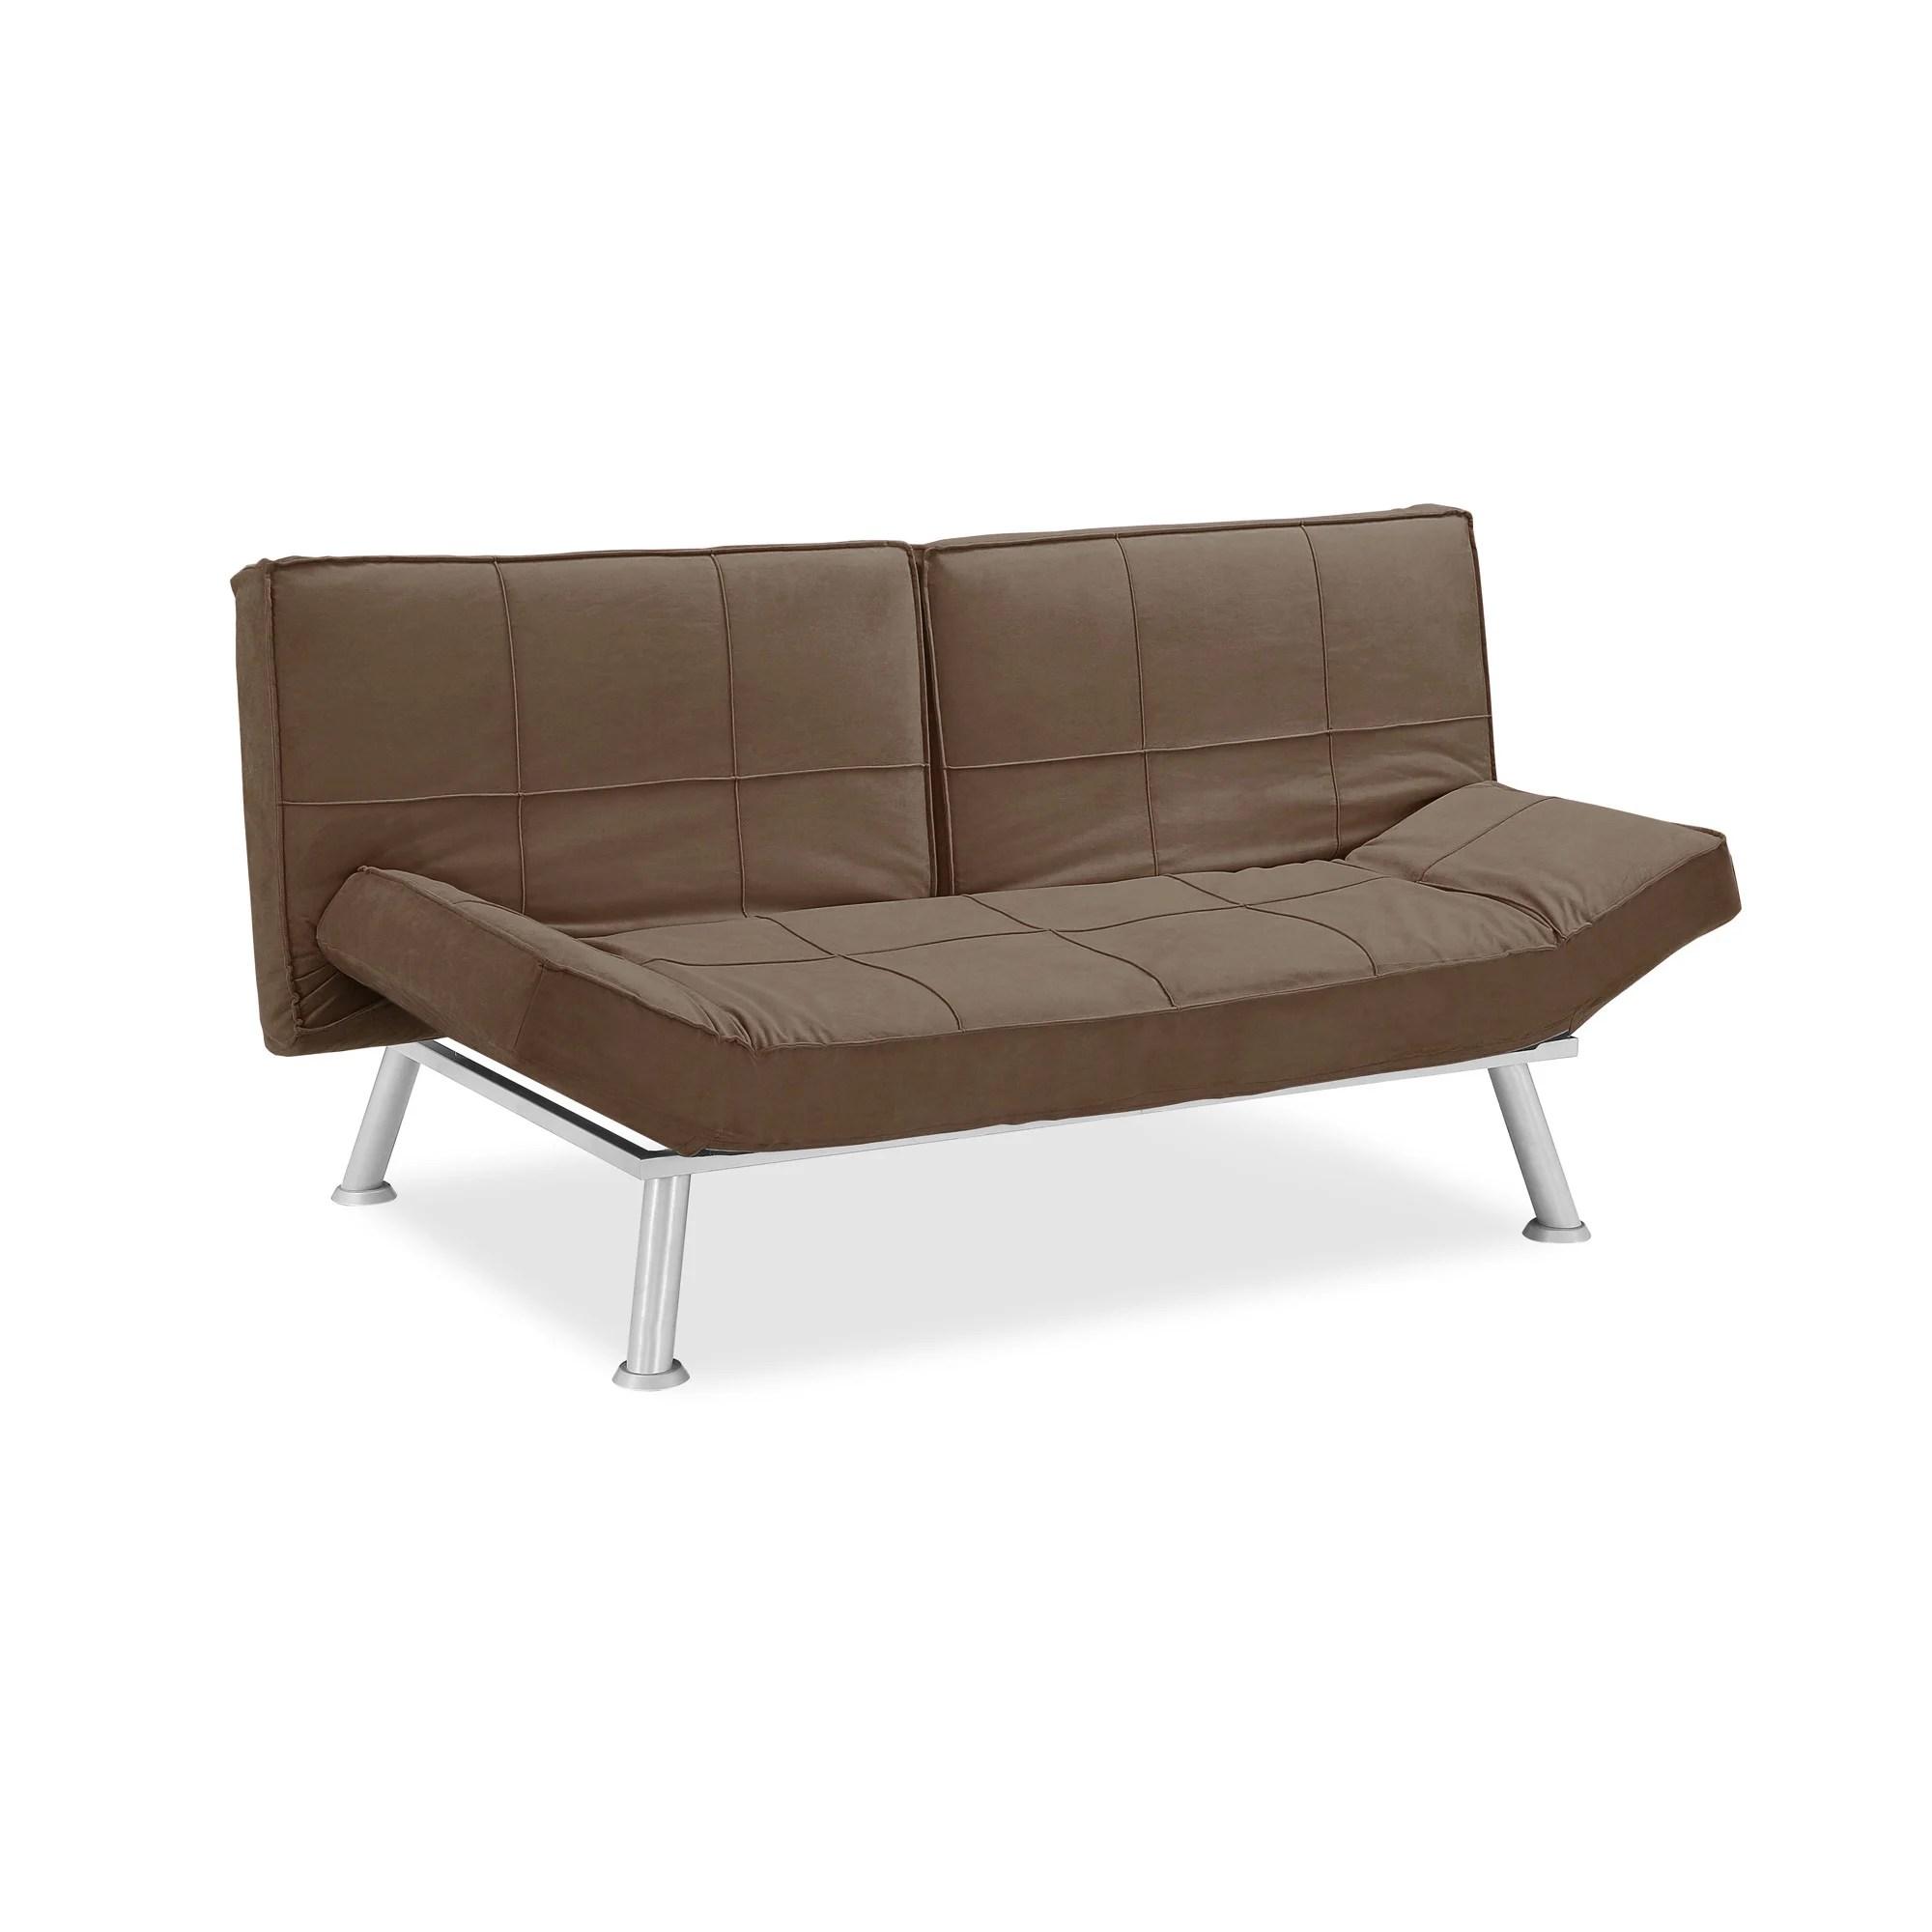 newport sofa convertible bed natuzzi leather malta maxson java by serta lifestyle